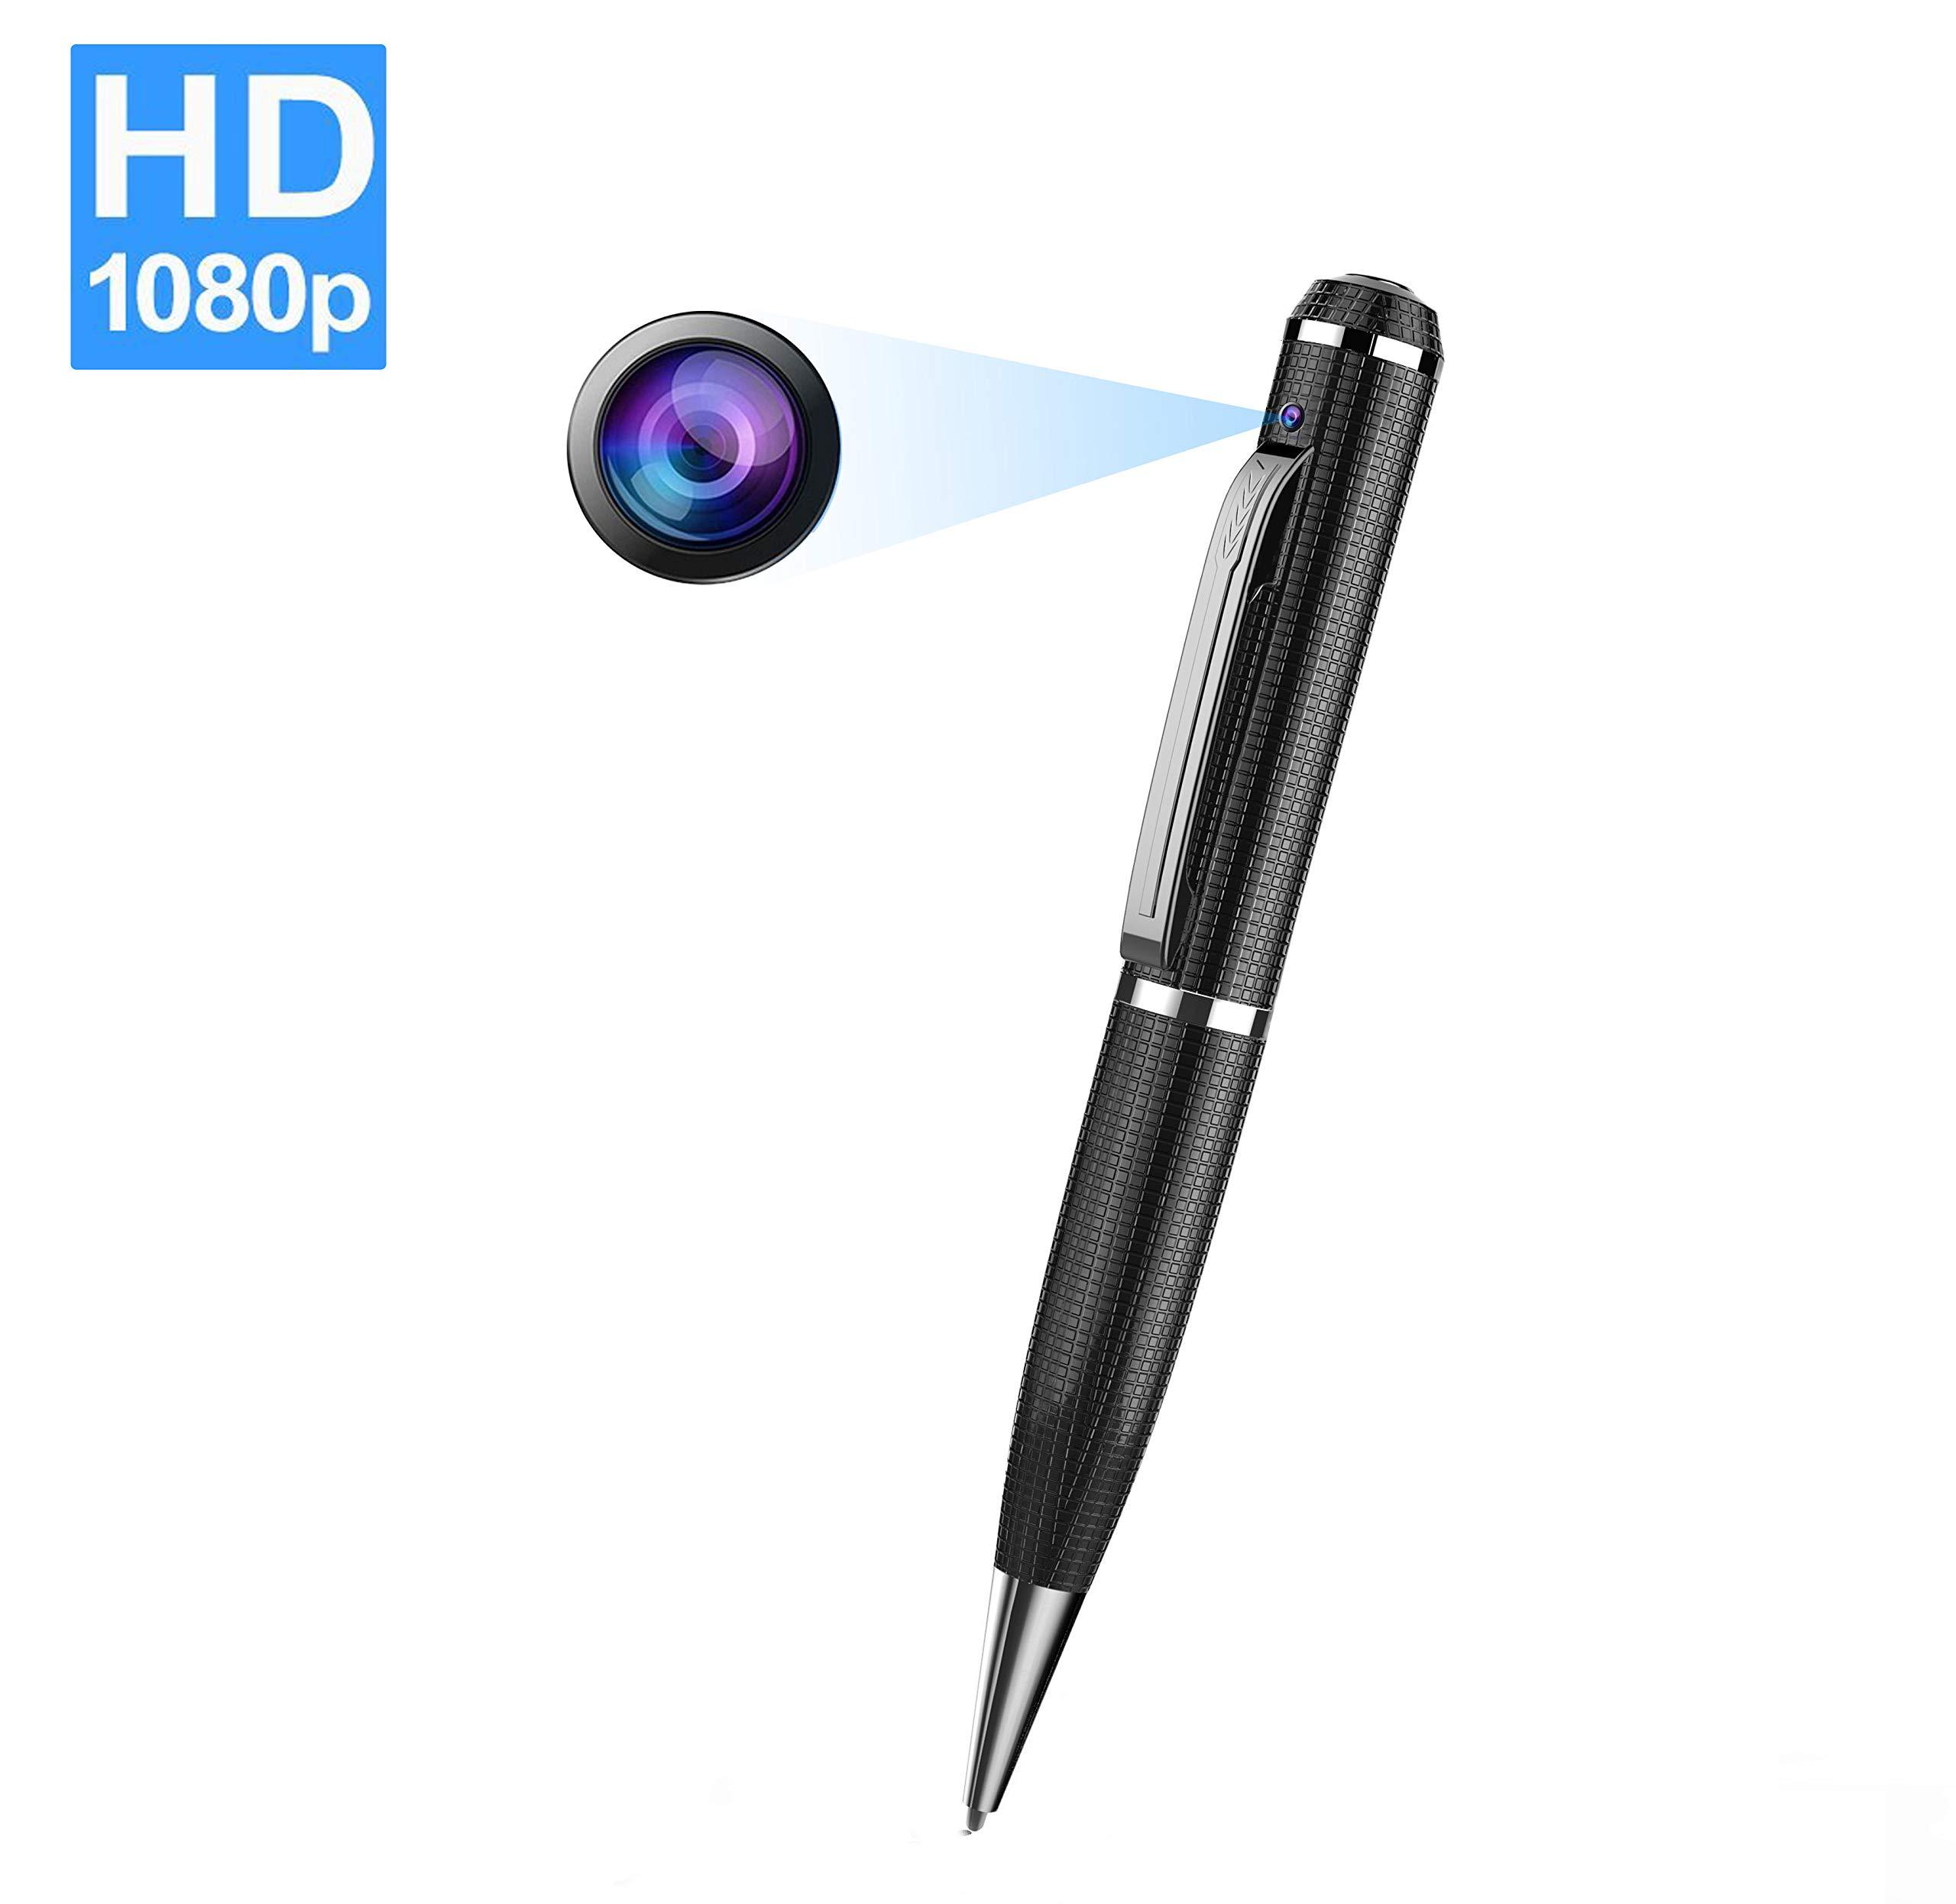 CHUHE FHD 1080P Hidden Pen Camera Mini Protable Pocket Video Recording Suport Max 32G SD Card